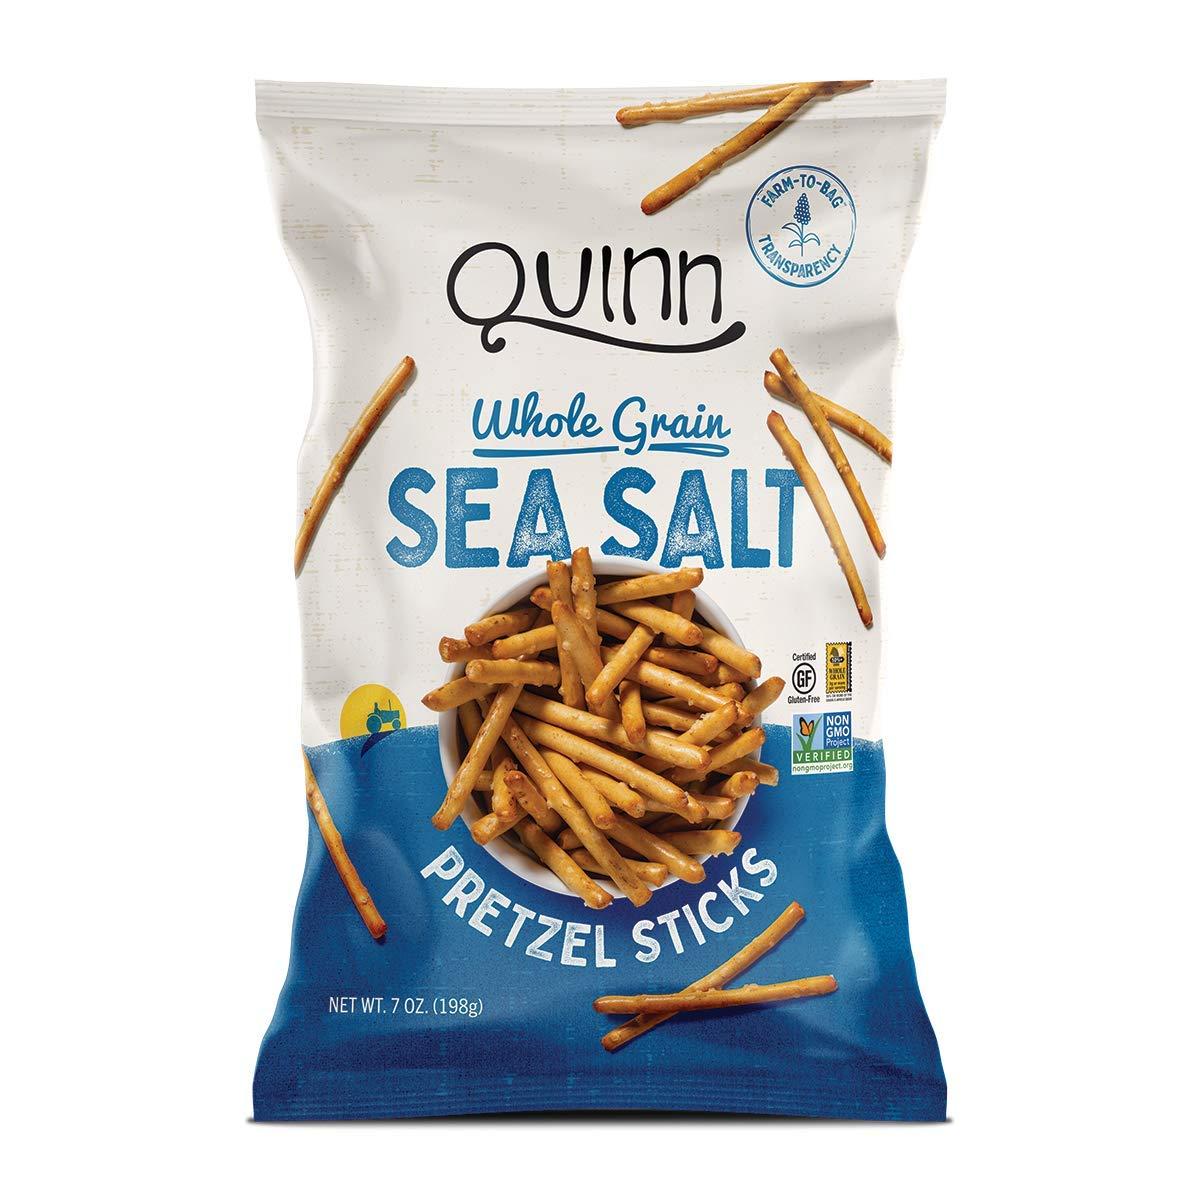 Quinn Sea Salt Pretzel Sticks, Gluten Free Pretzels, Vegan Friendly, Corn Free, Soy Free, Non-GMO, 7 Oz, Pack Of 4